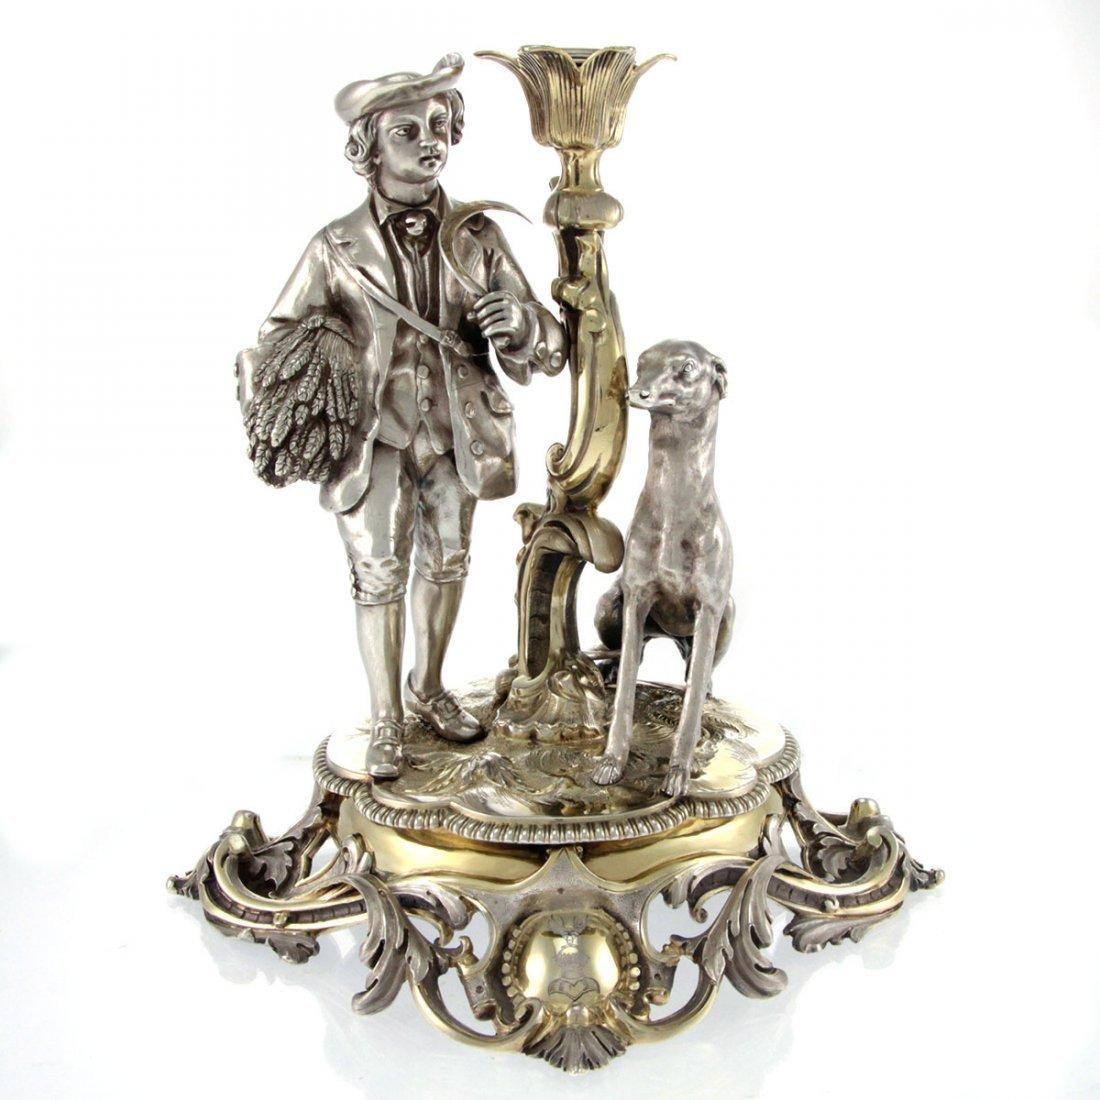 RARE Sterling Silver Centerpiece Smith & Nicholson 1861